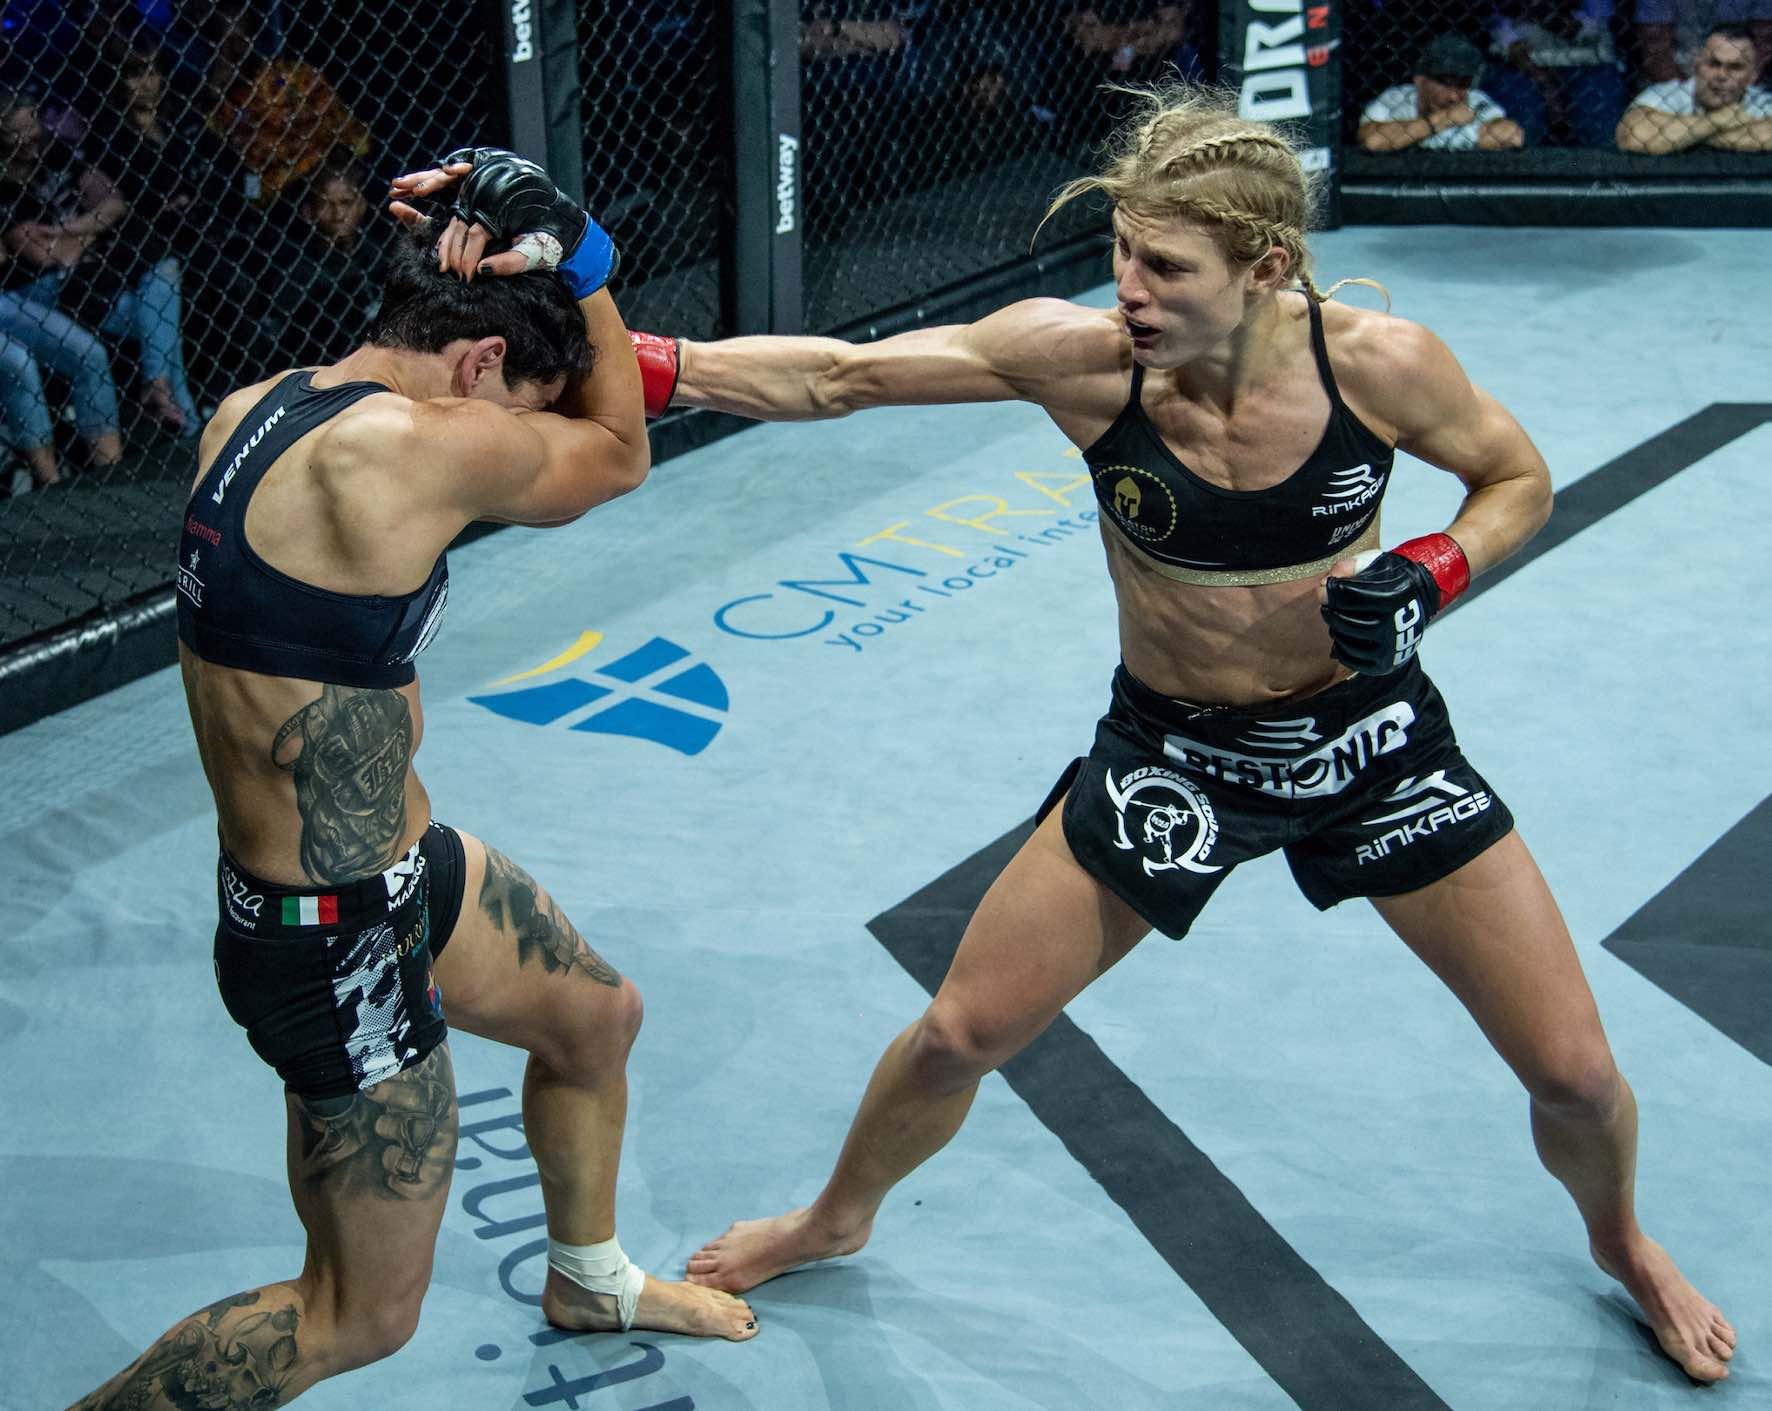 MMA Flyweight Tile Fight between Amanda Lino and Manon Fiorot